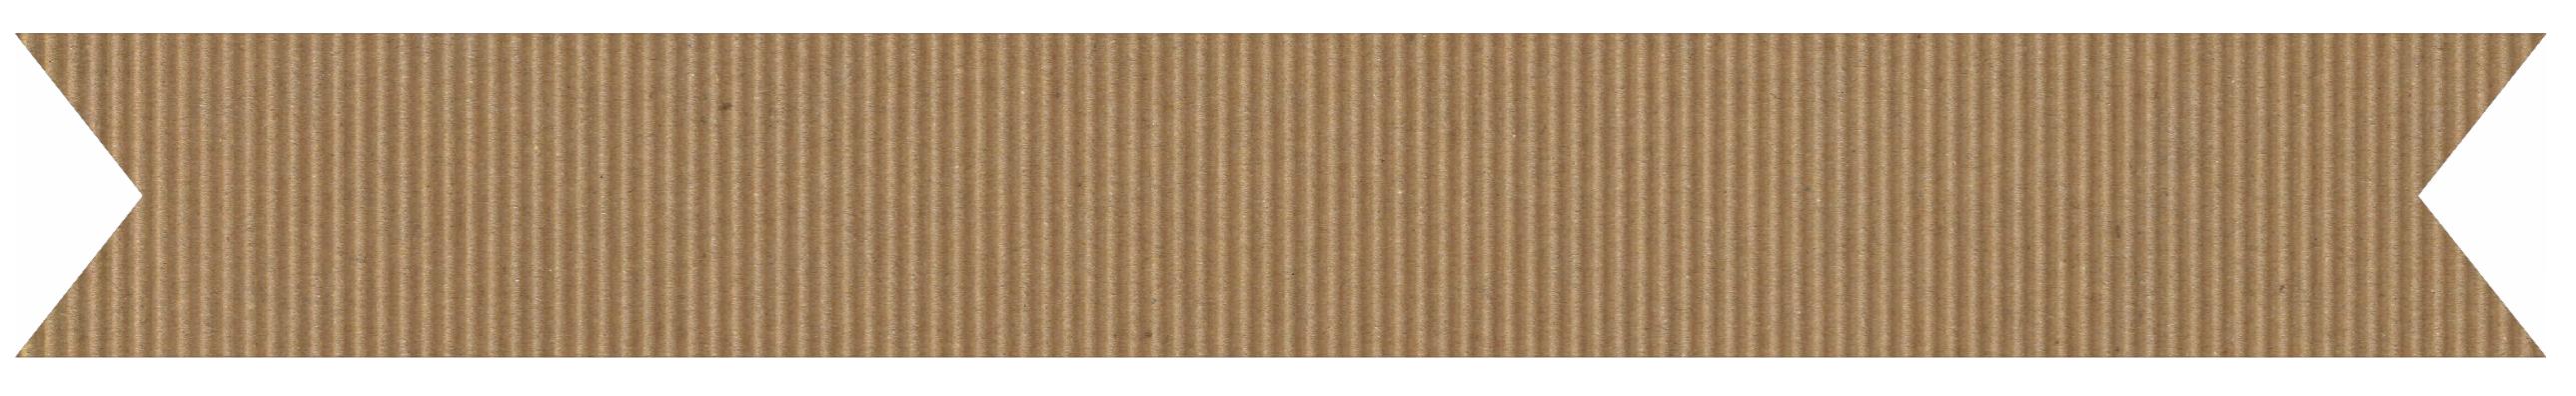 Burlap Cork Amp Cardboard Texture Background Printables